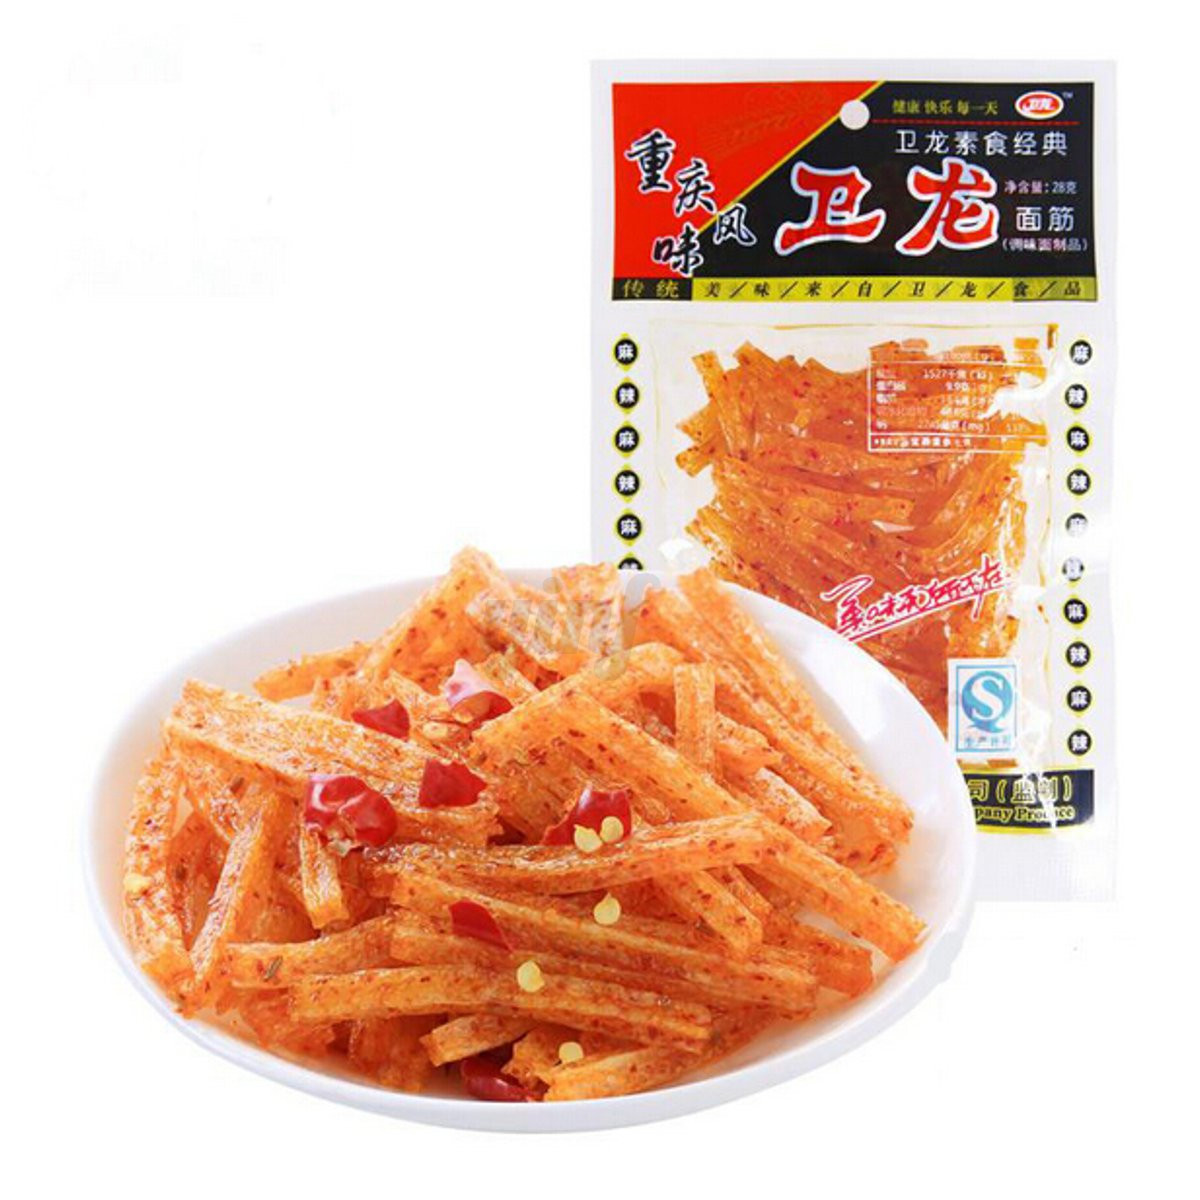 Gluten Free Chinese Food Dc